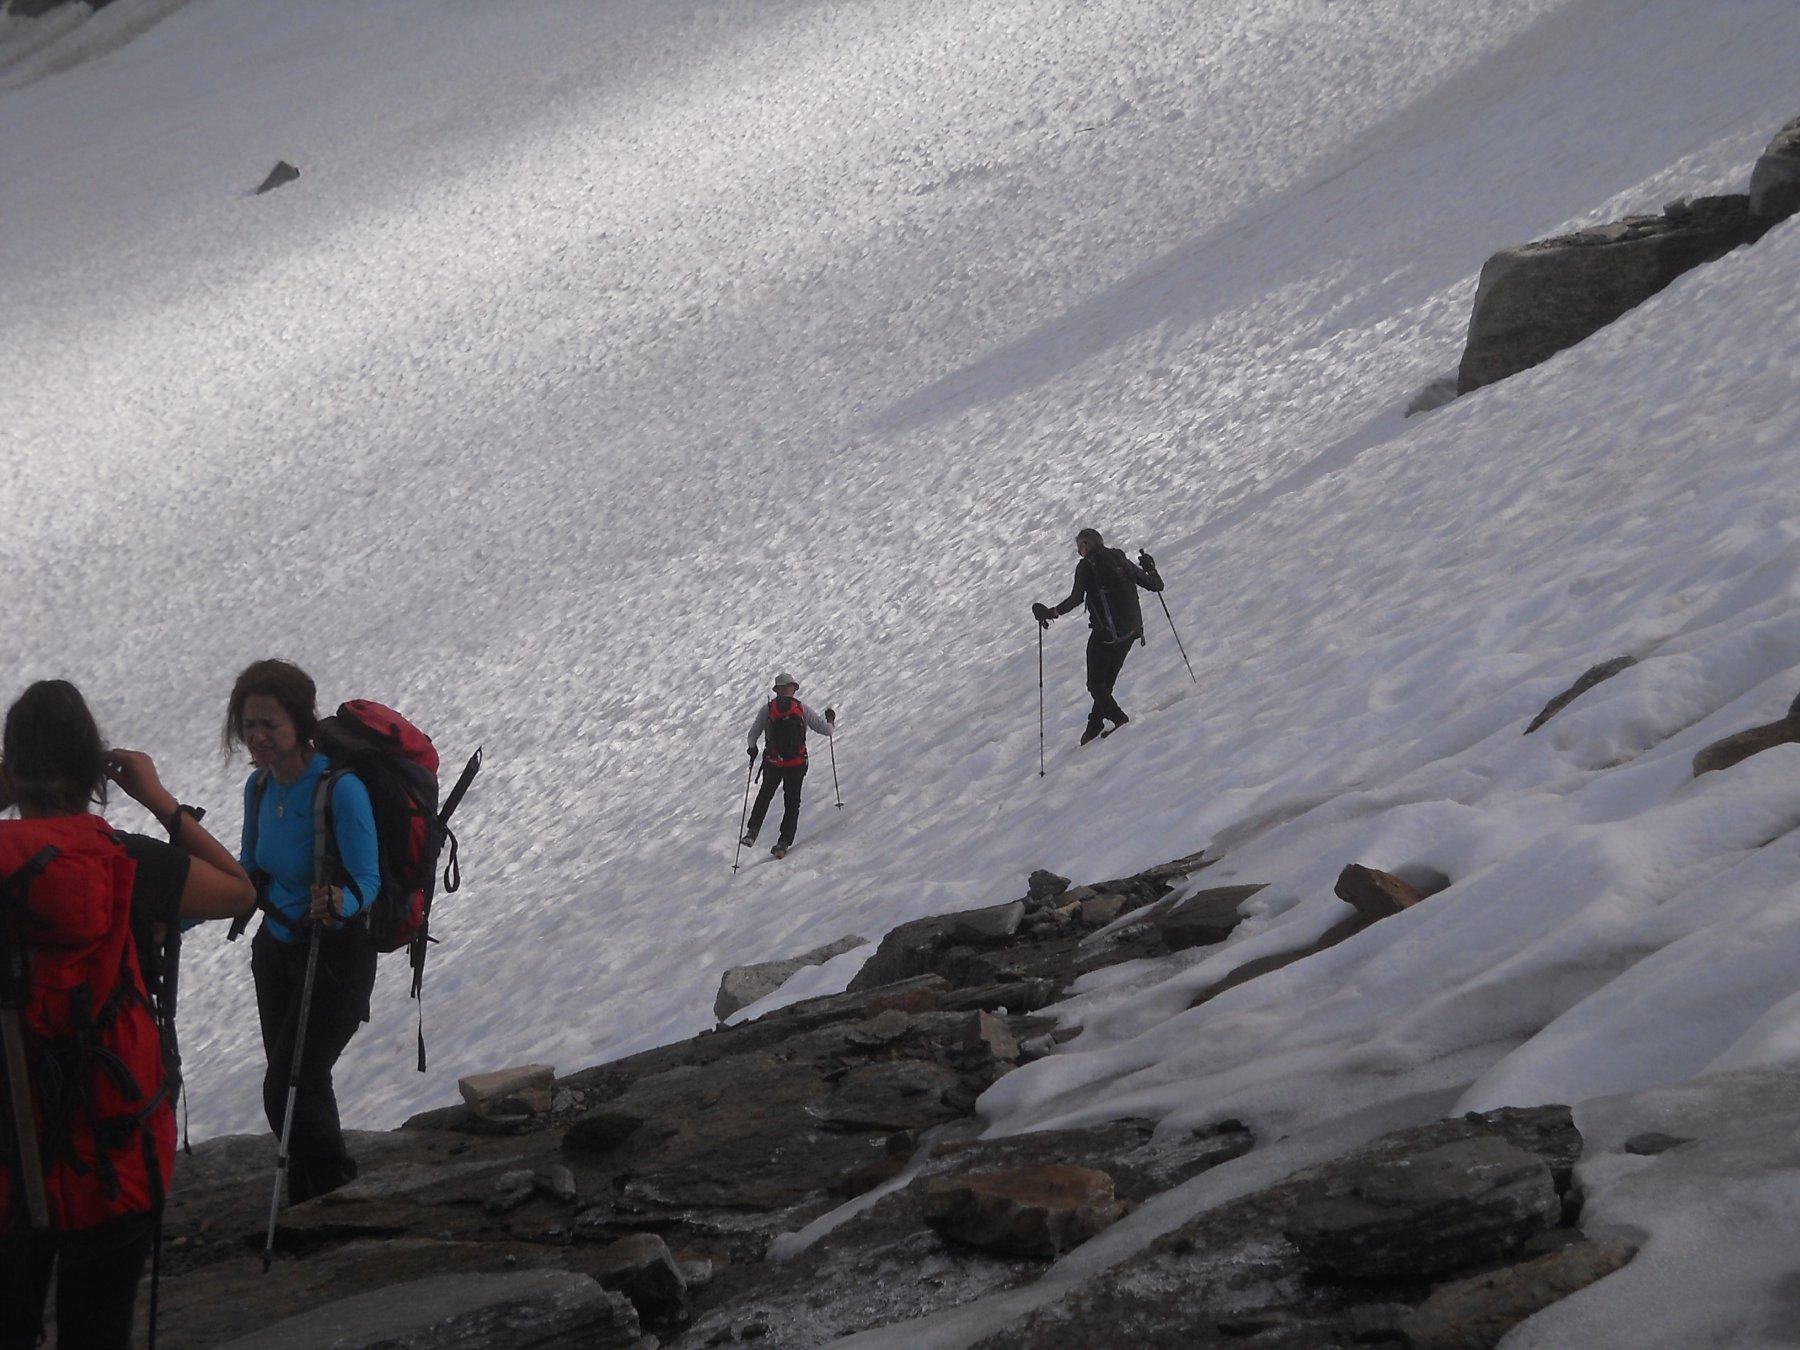 variante in discesa sul nivo-ghiacciaio